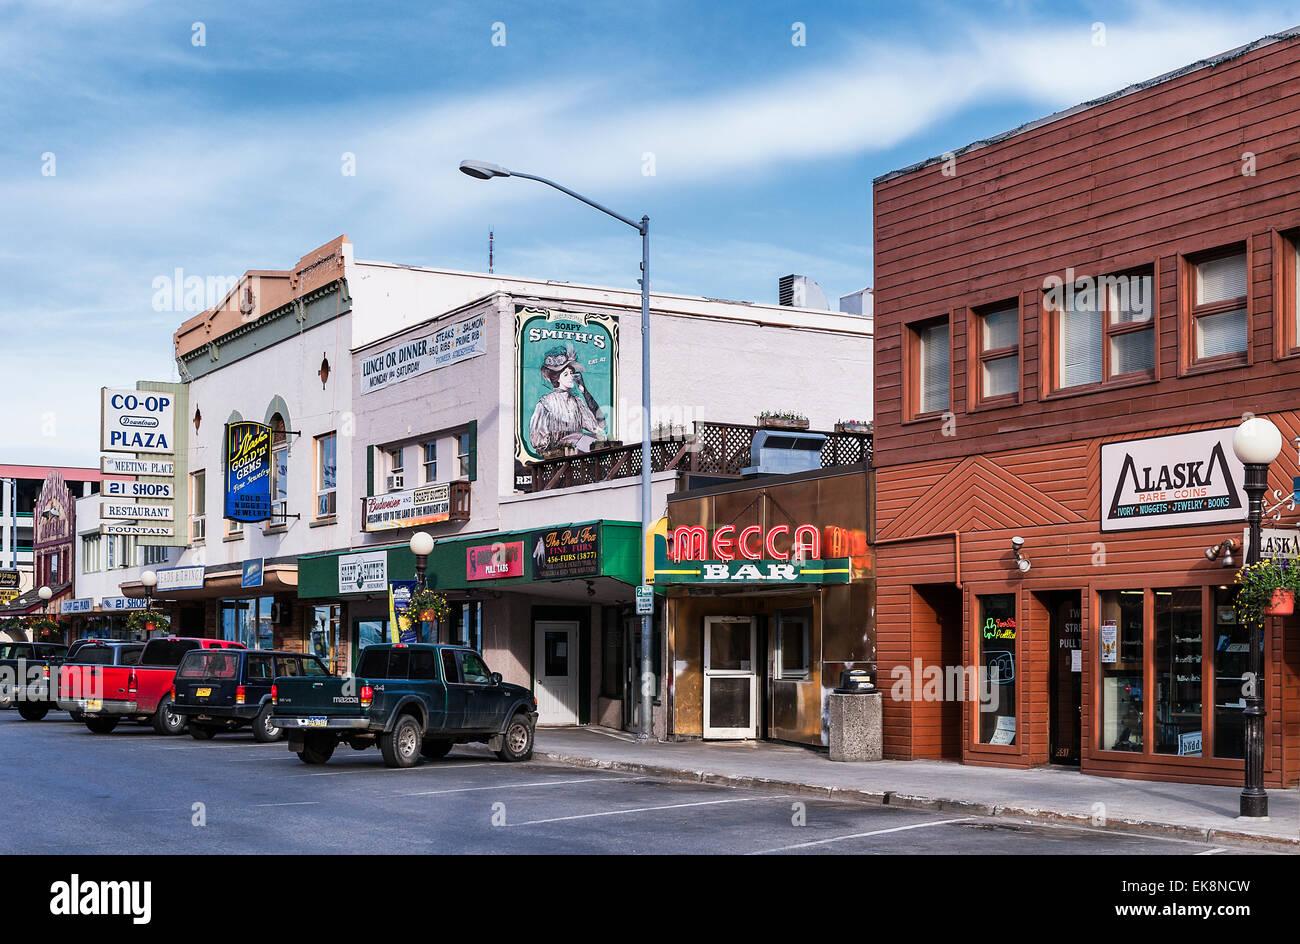 Shops along 2nd street, Fairbanks, Alaska, USA - Stock Image